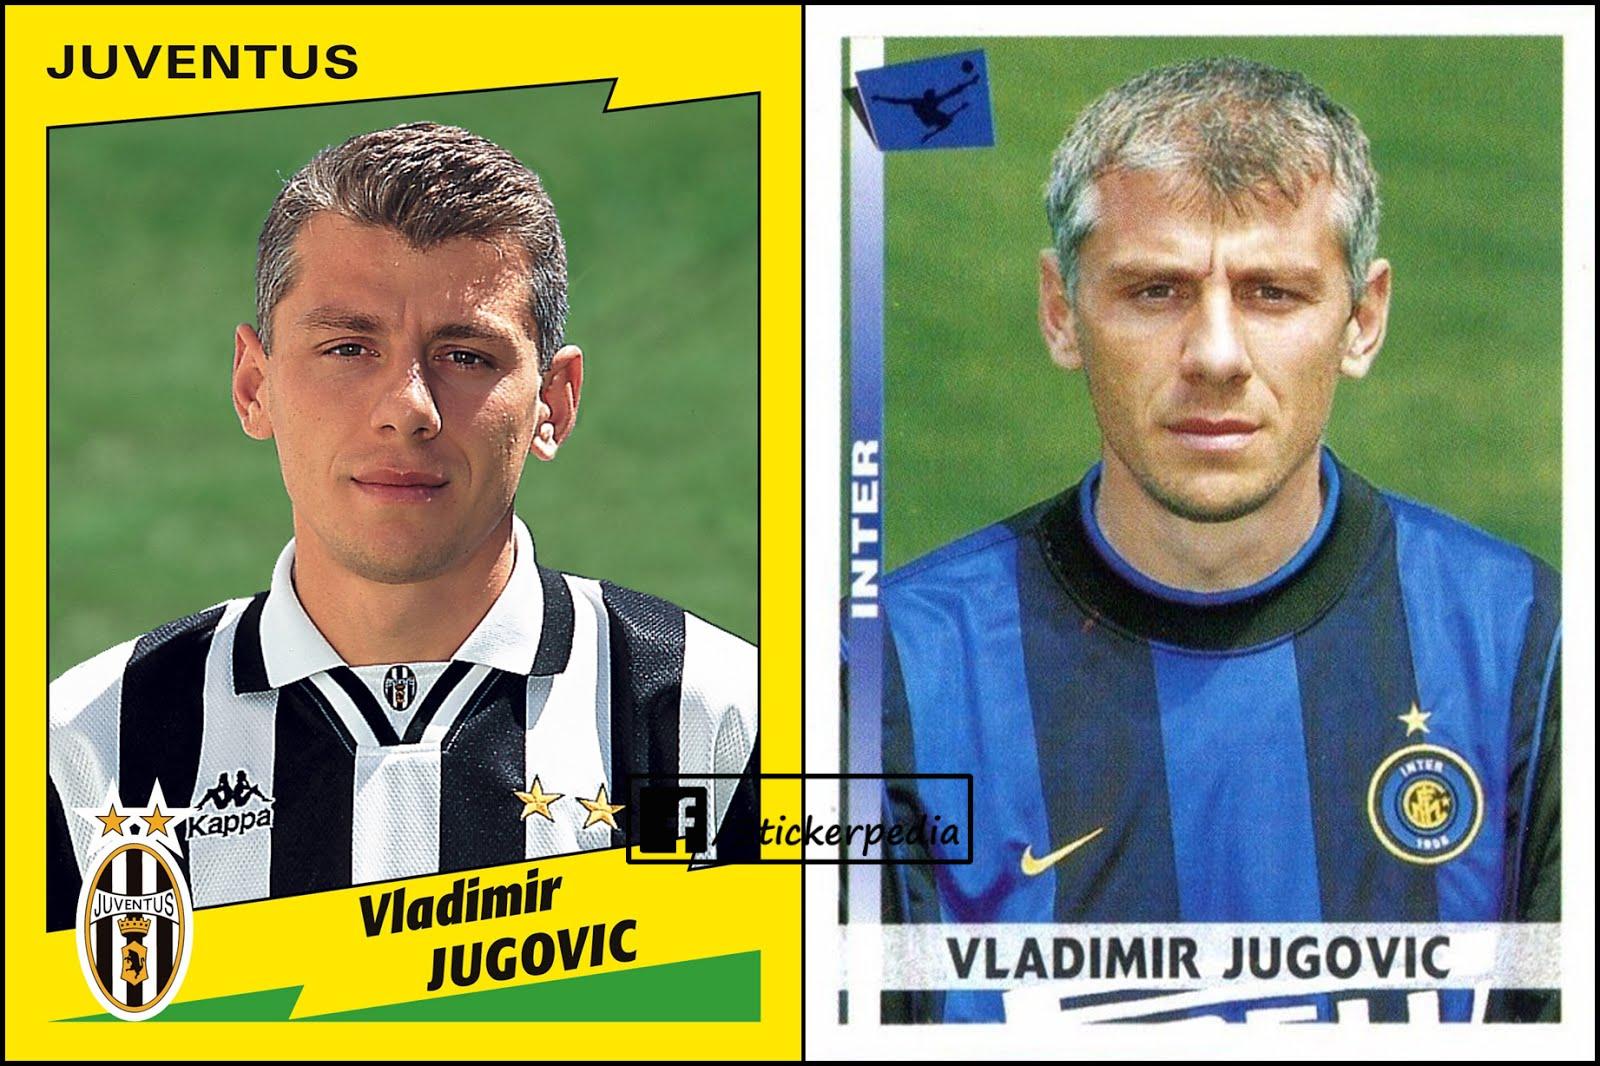 68 JUVENTUS -New EUROPEAN FOOTBALL STARS JUGOVIC Figurina-Sticker n